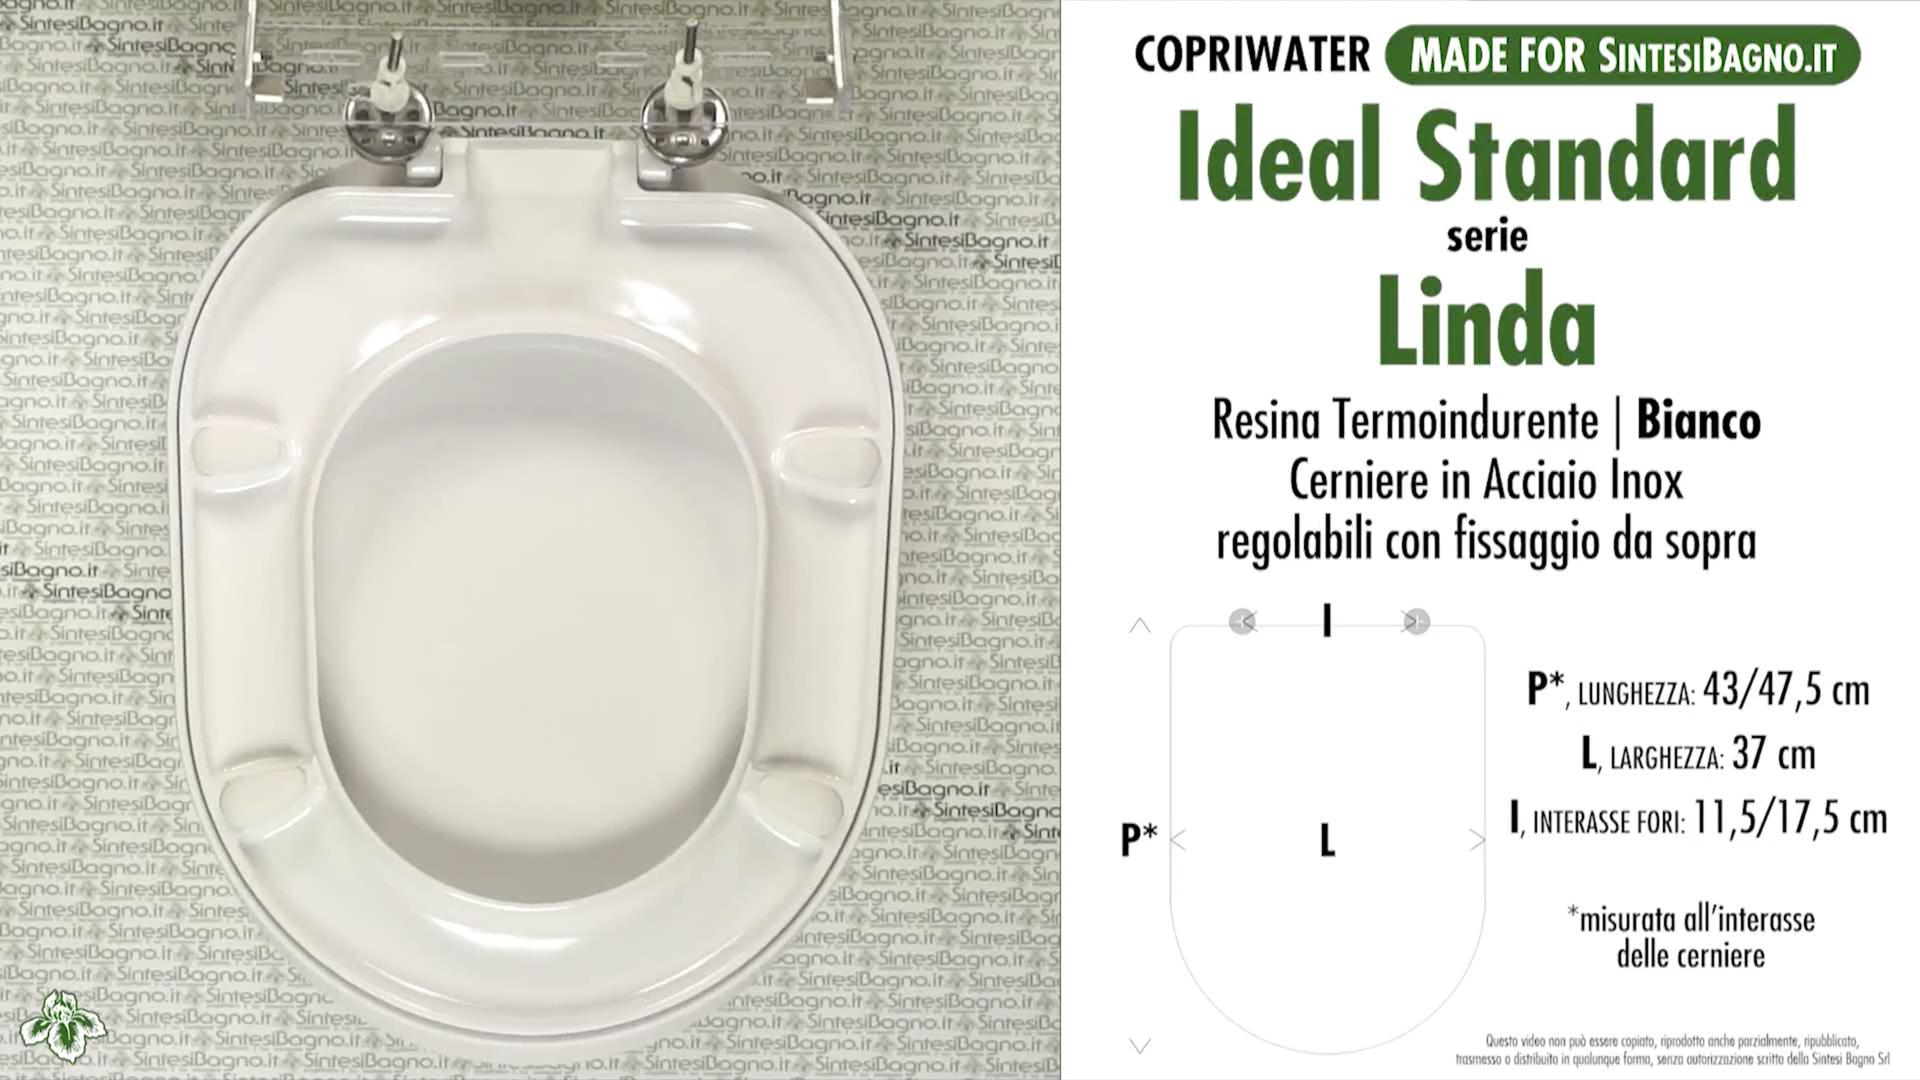 Schede tecniche misure copriwater ideal standard serie linda for Copriwater ideal standard